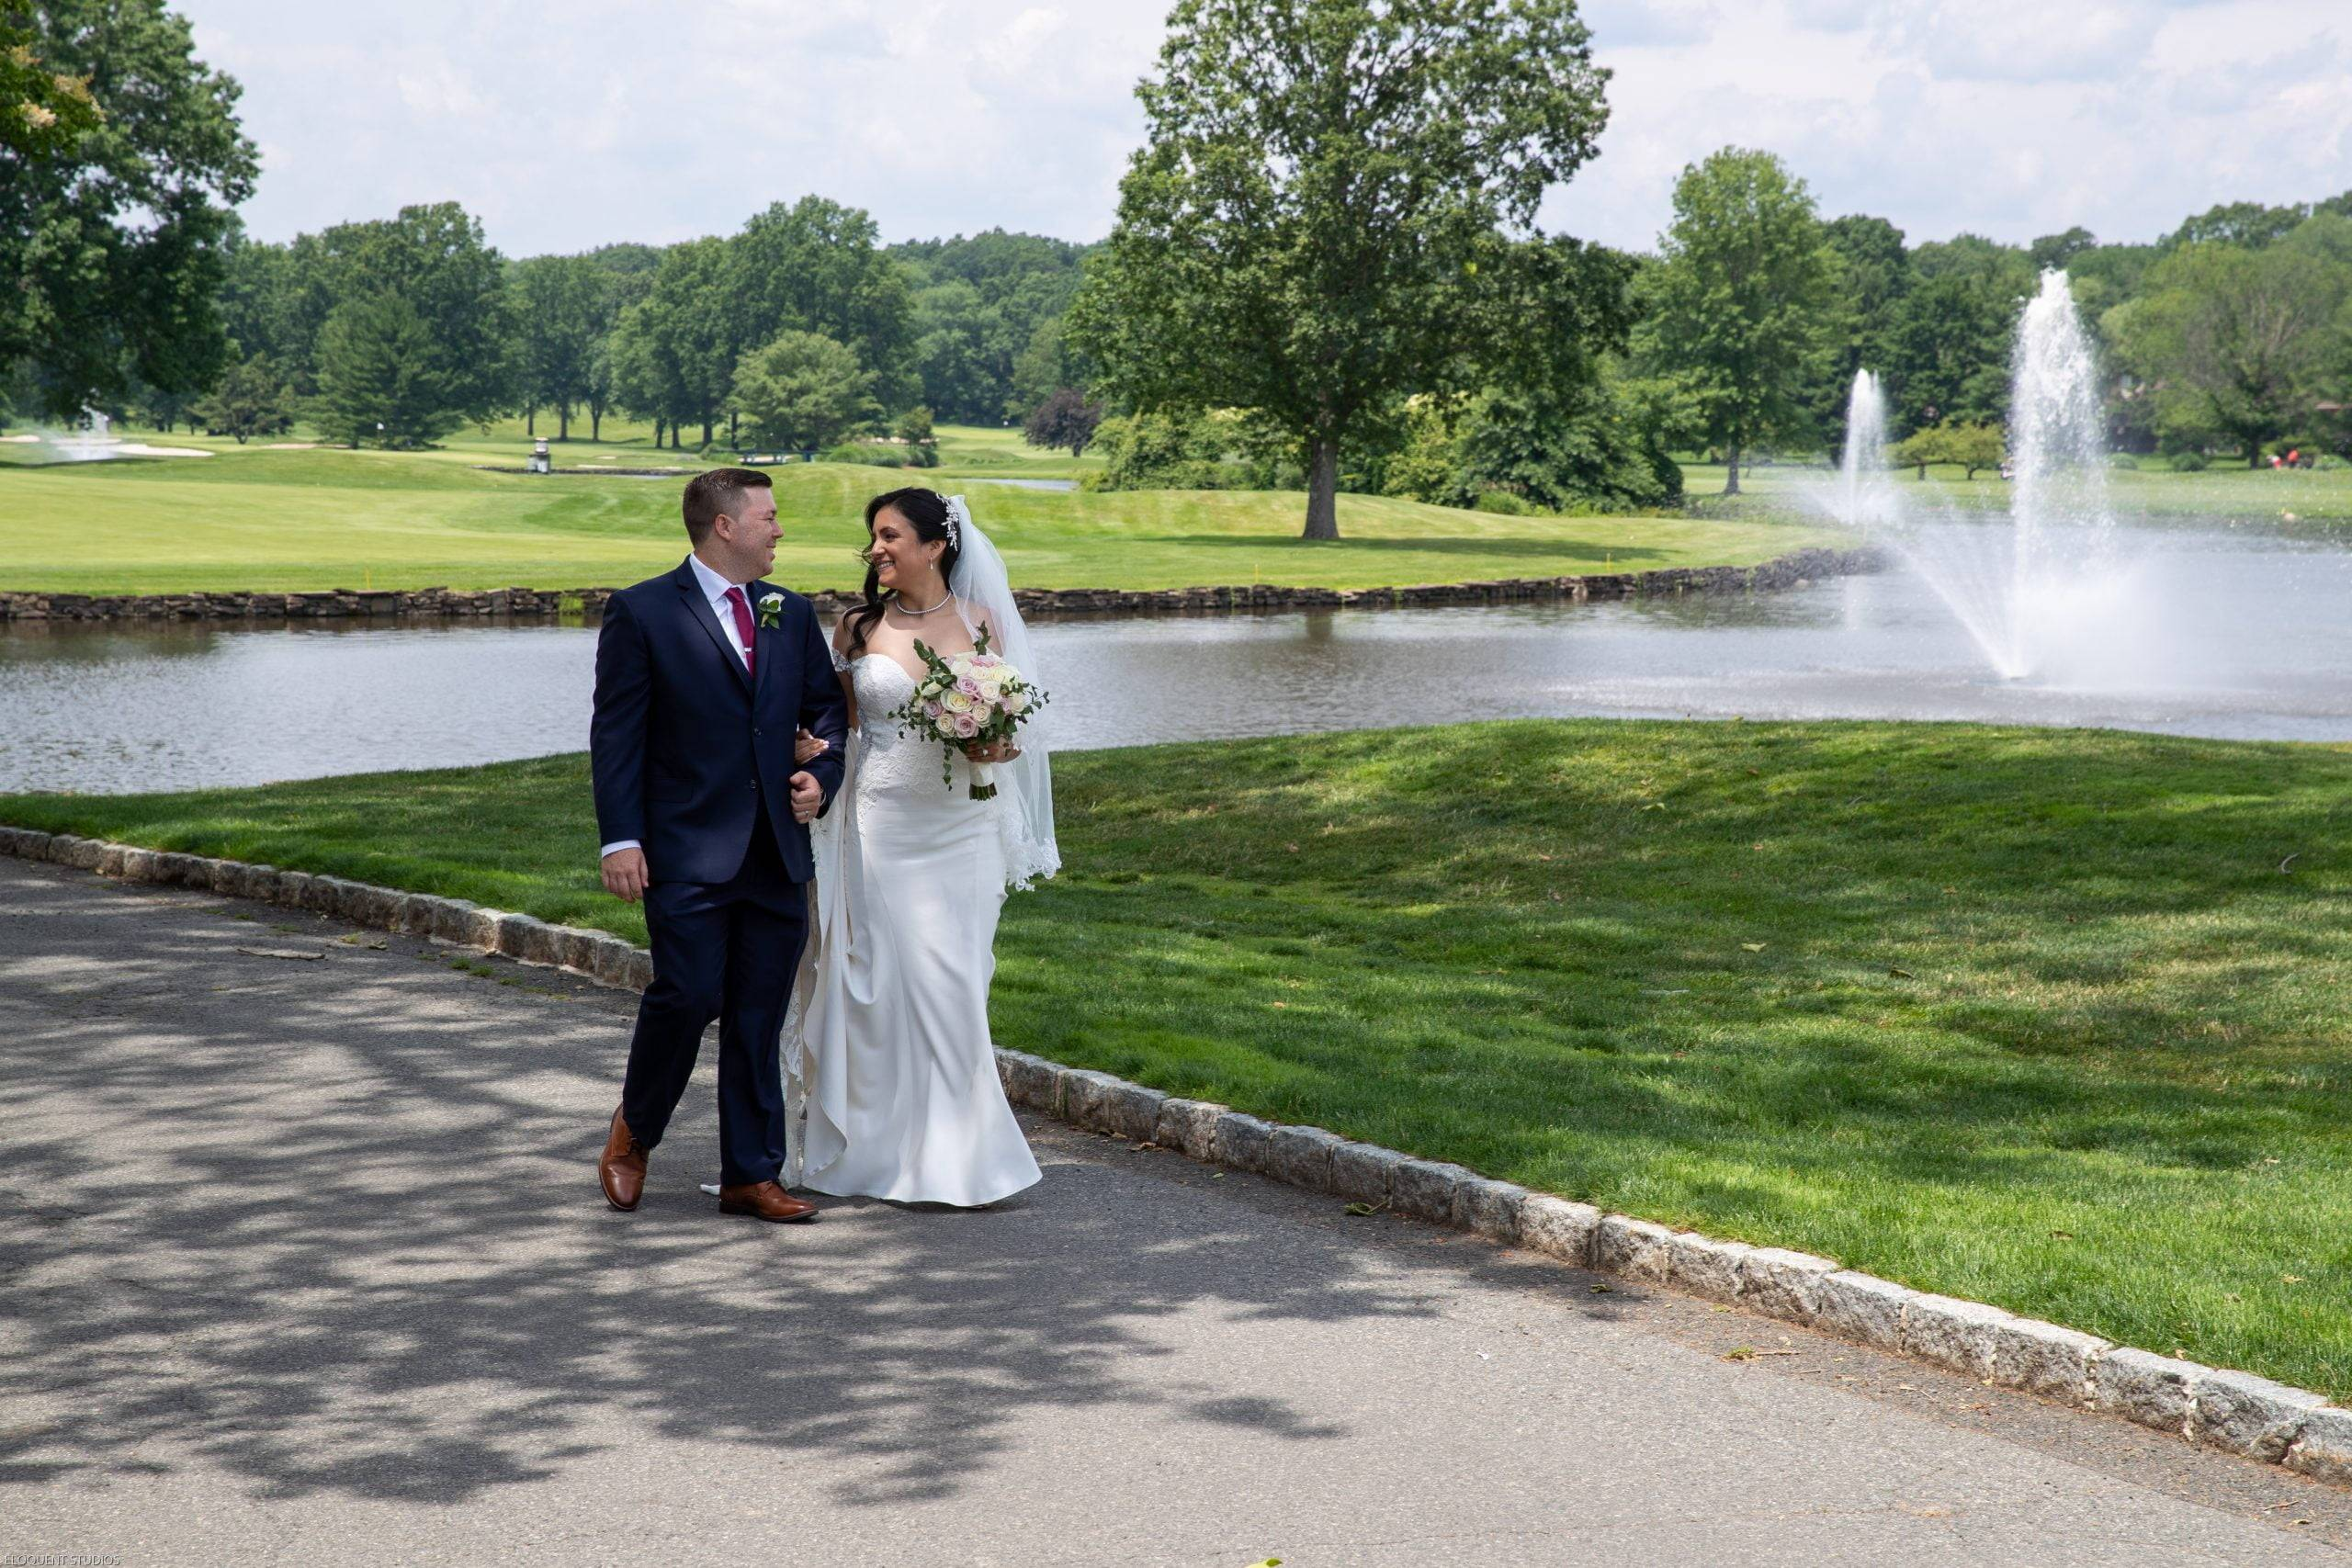 Brooklake bride and groom walking by the lake